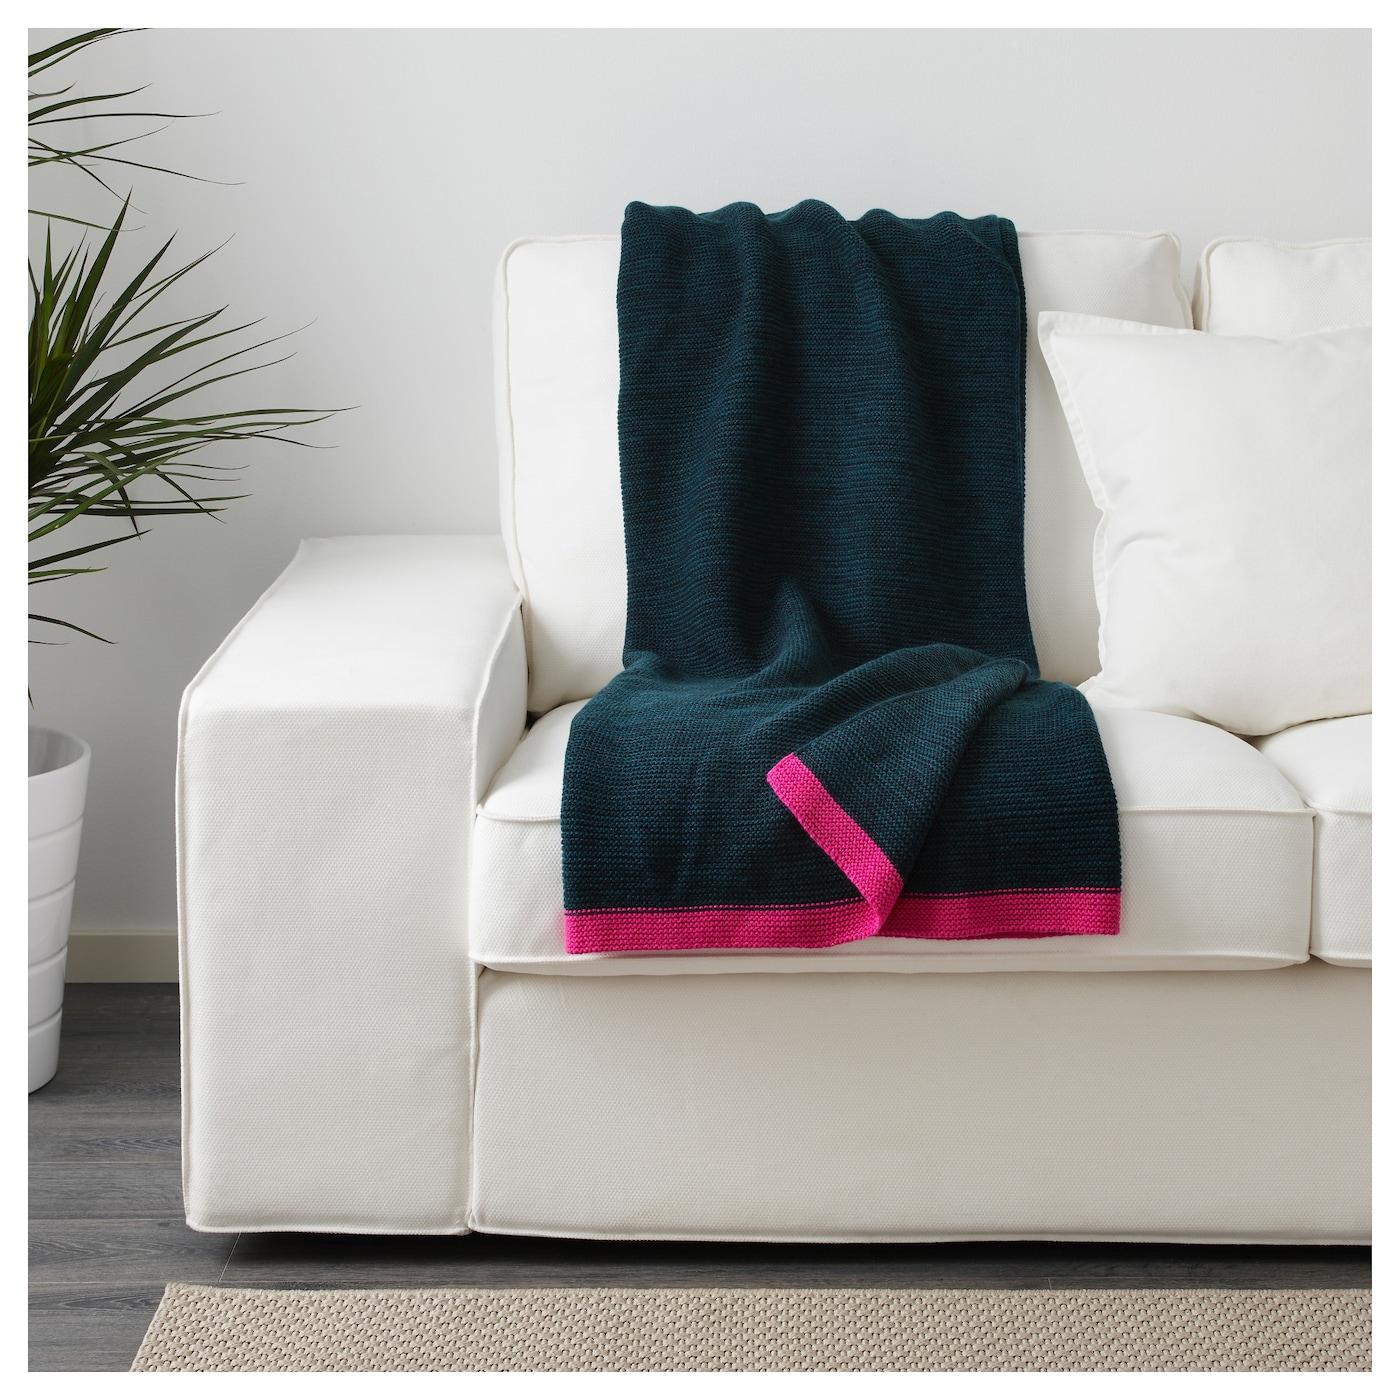 lisamari plaid bleu rose 130x170 cm ikea. Black Bedroom Furniture Sets. Home Design Ideas